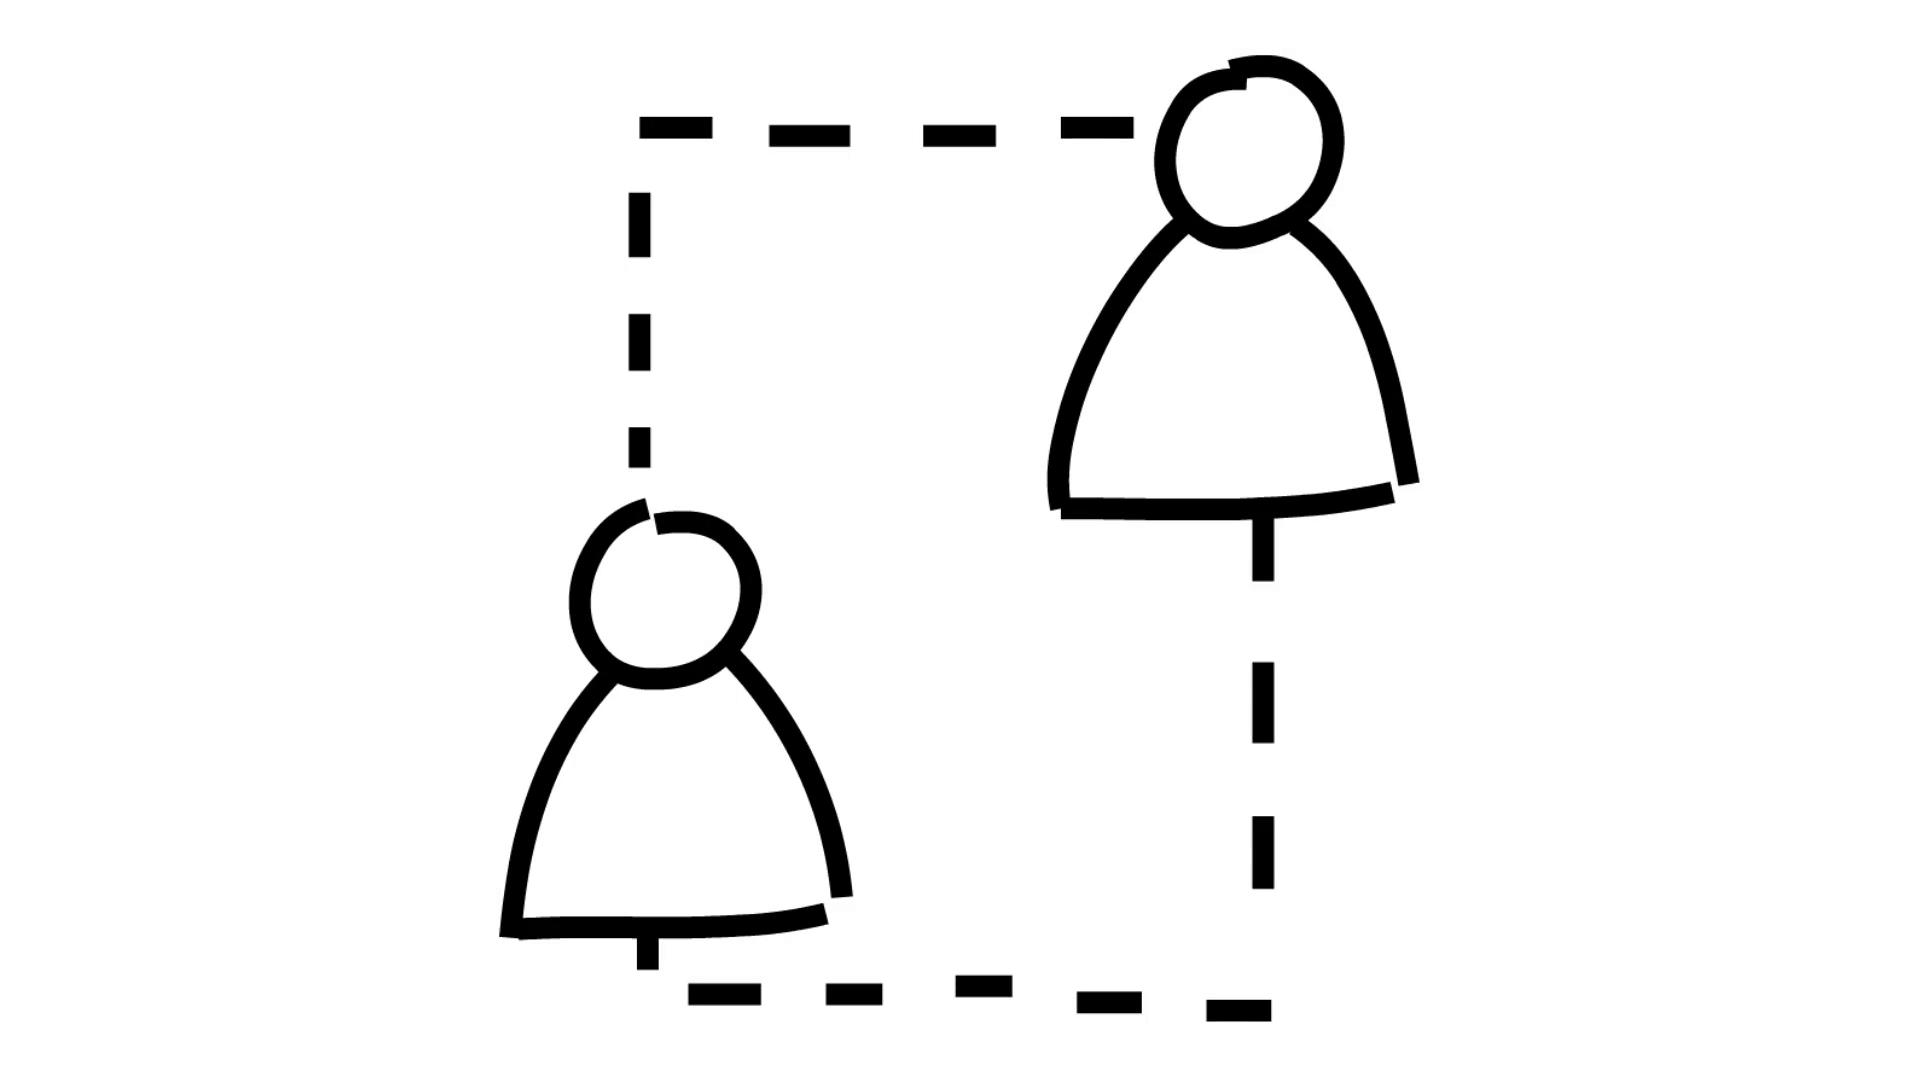 1920x1080 Business Communication Network Line Drawing Illustration Animation